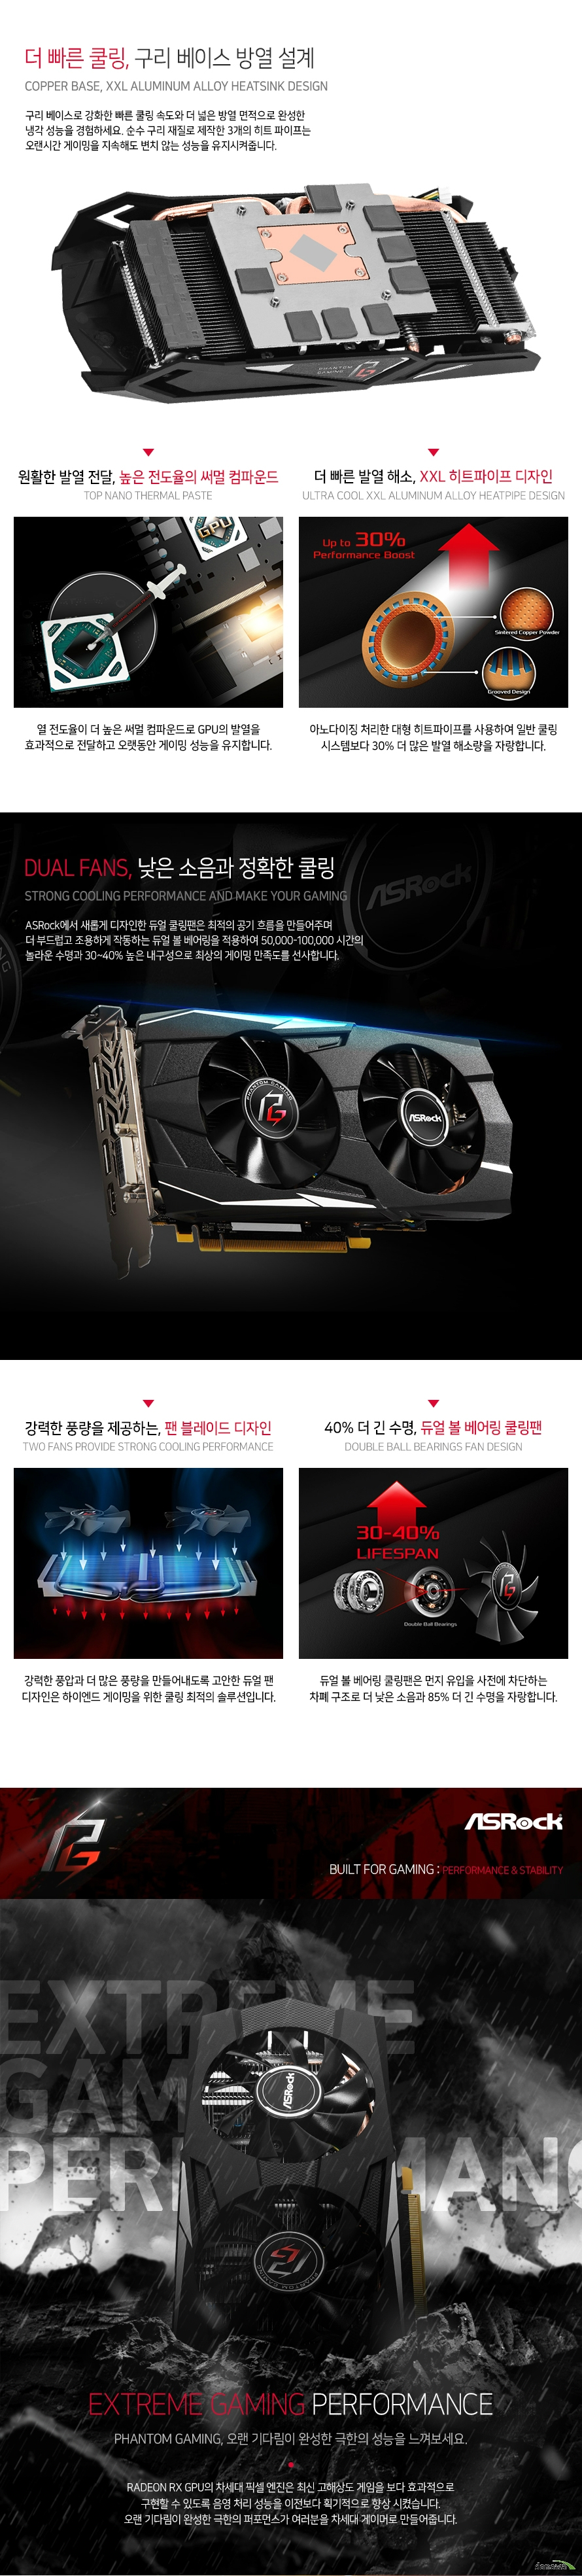 ASRock Phantom Gaming D 라데온 RX 570 D5 4GB 에즈윈